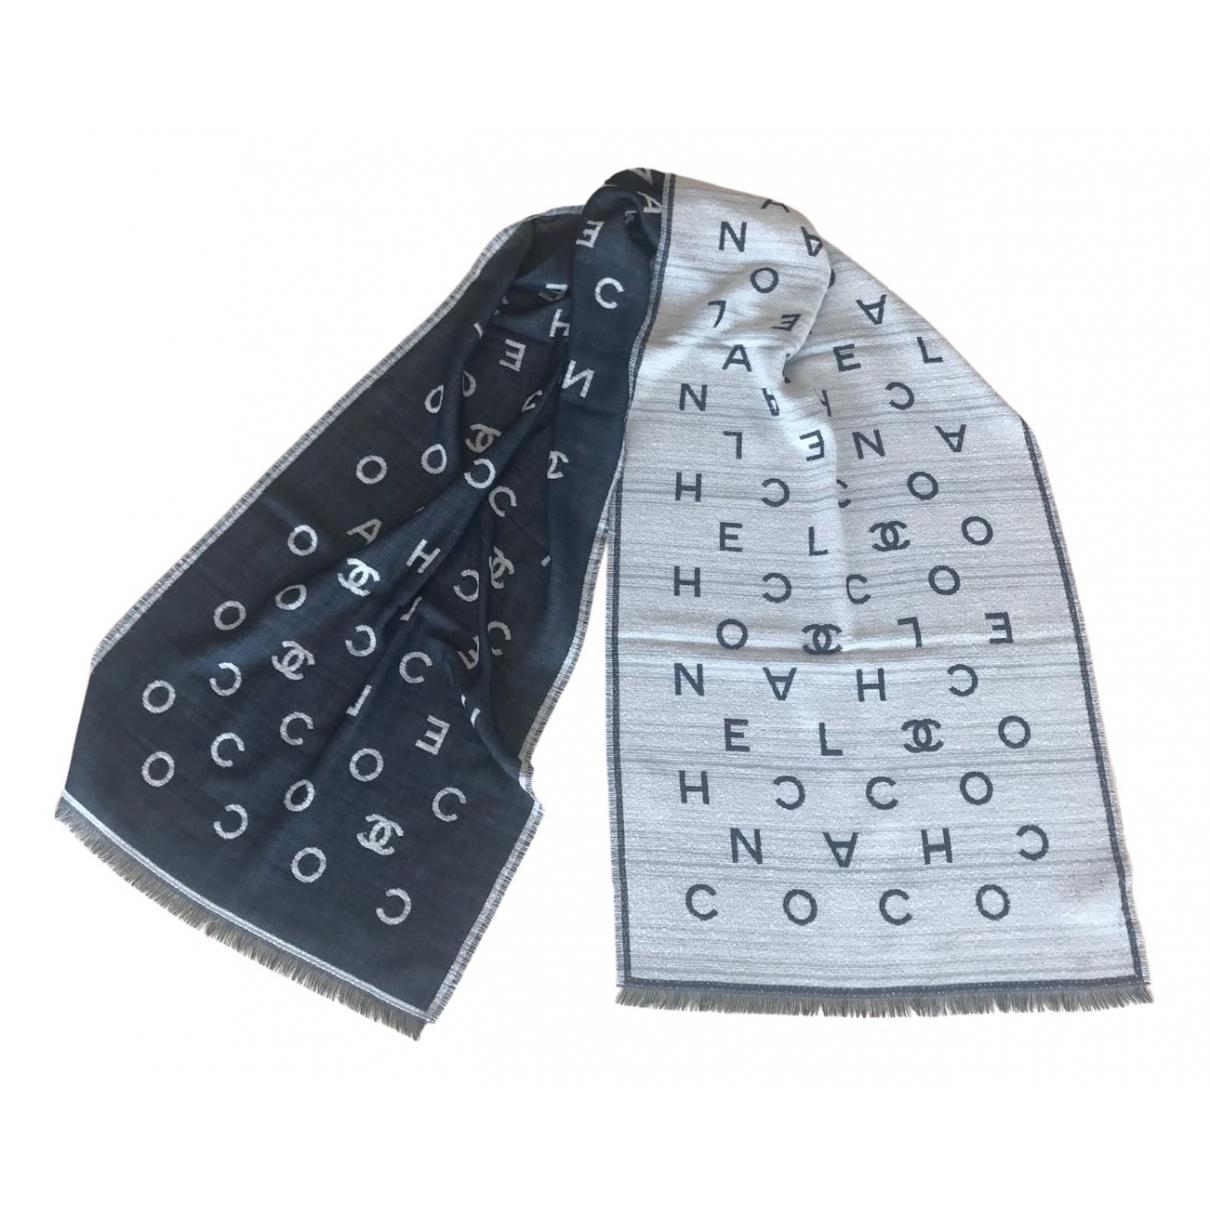 Chanel \N Beige Cashmere scarf for Women \N